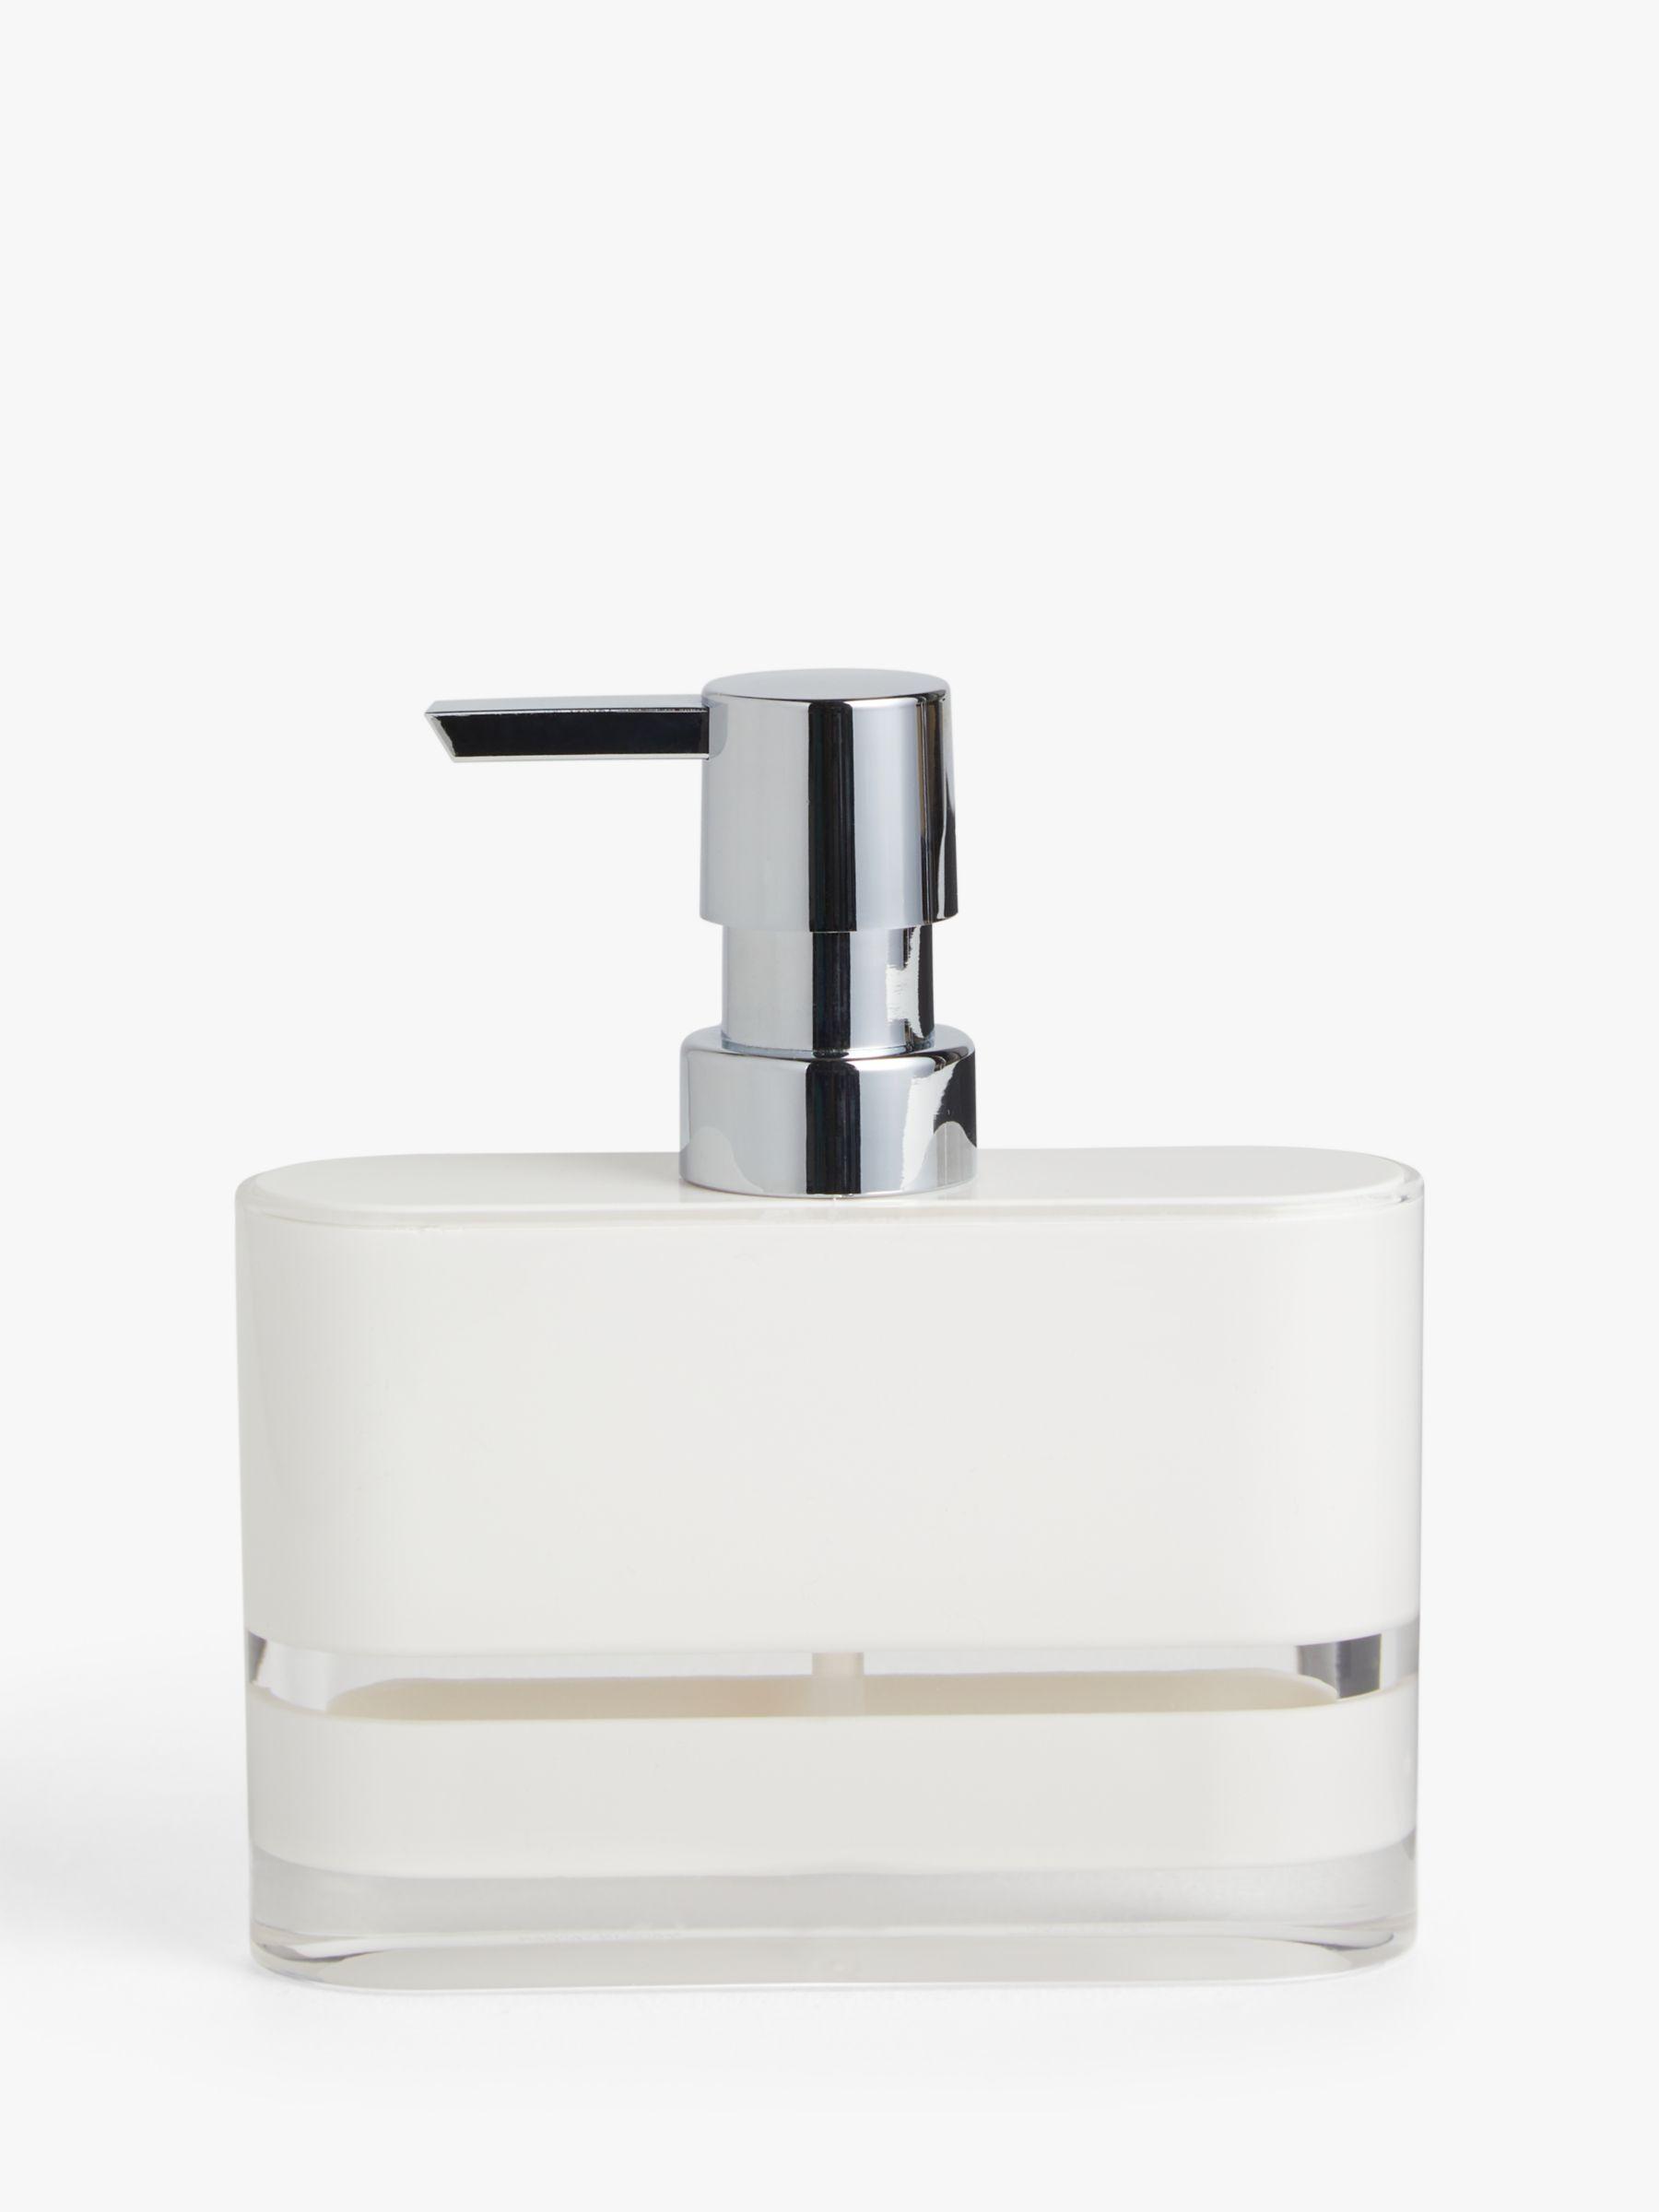 ANYDAY John Lewis & Partners Block Stripe Soap Dispenser